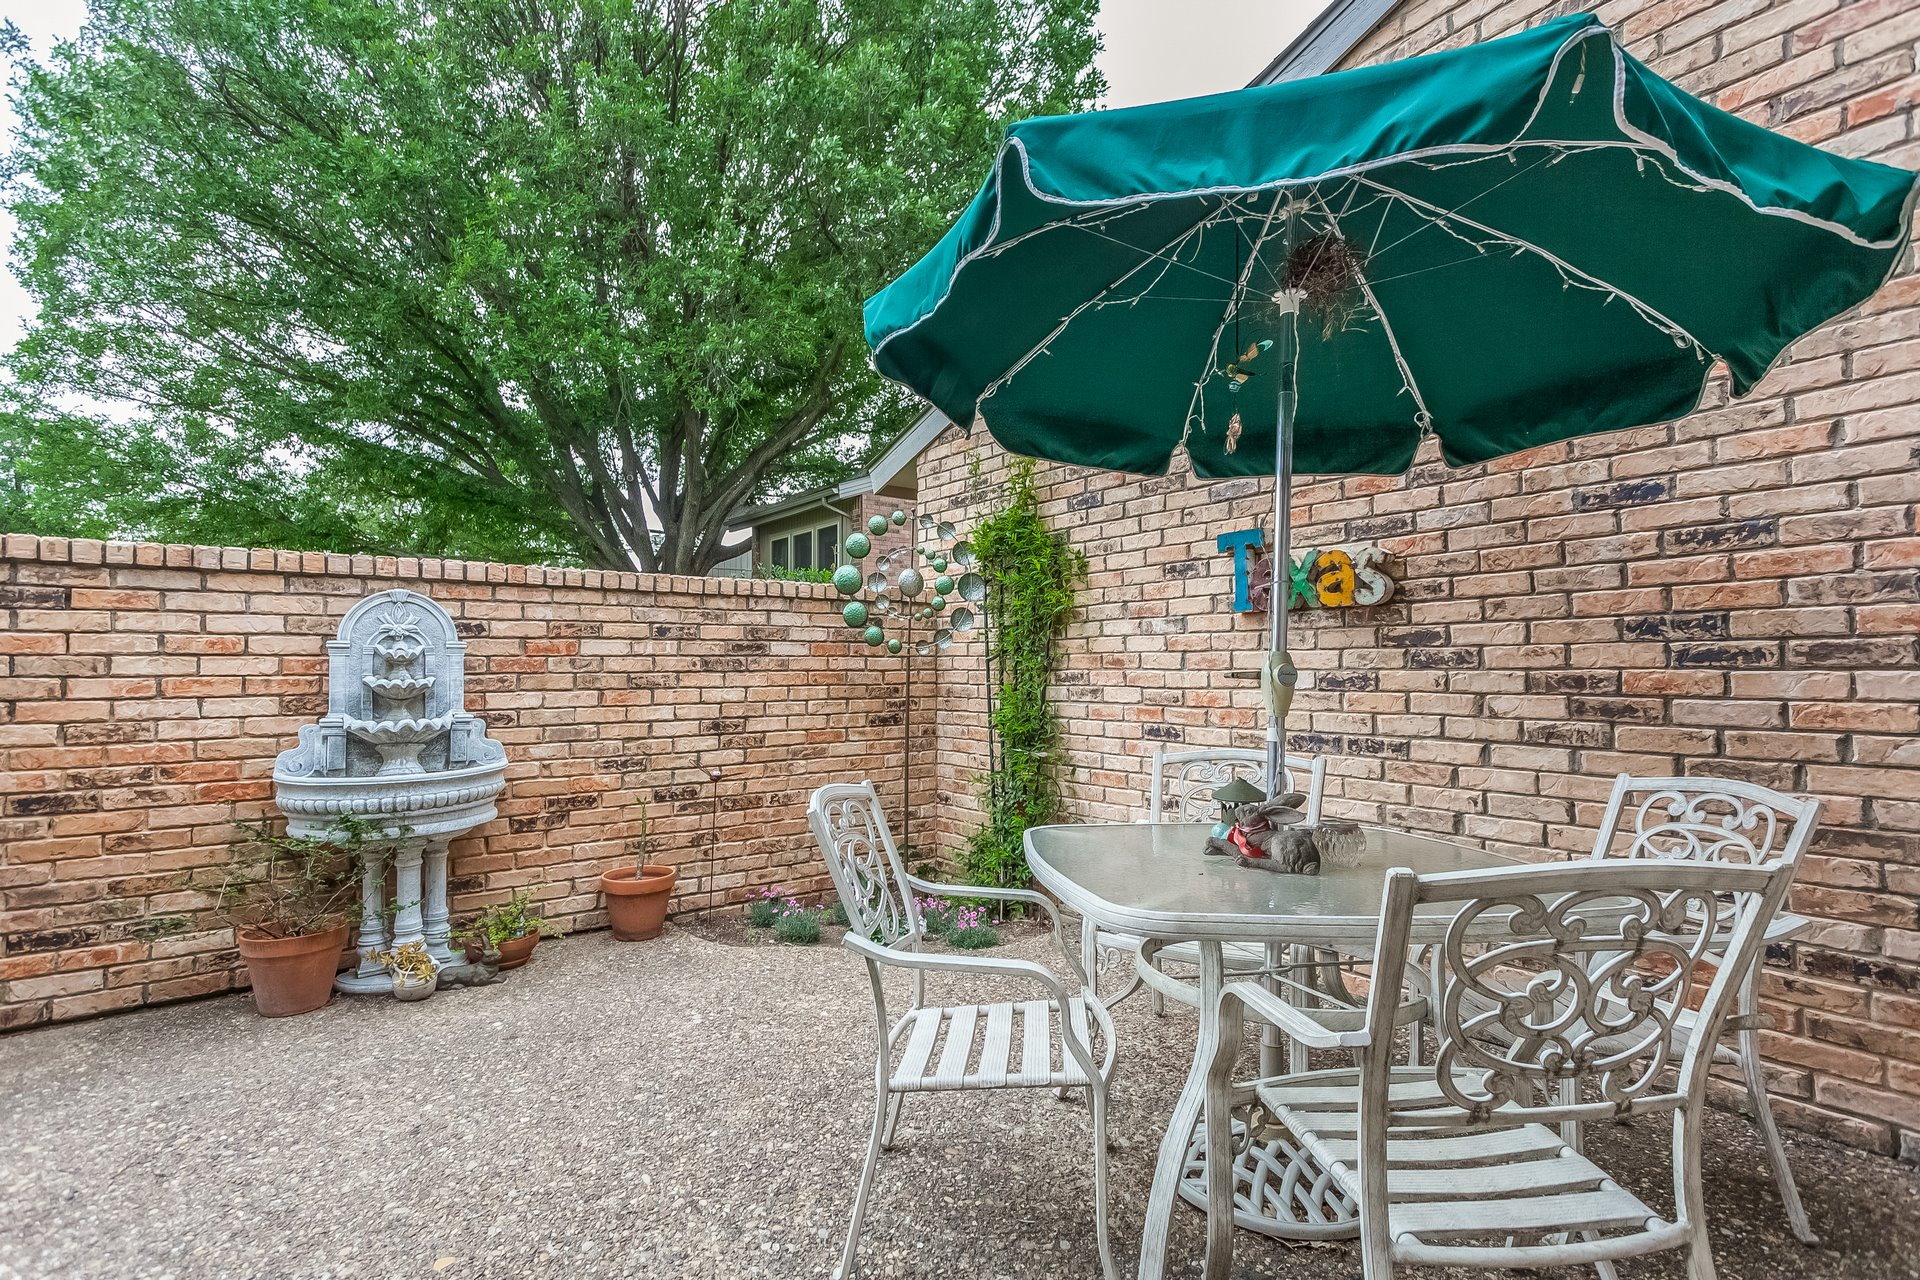 27 - 12598 Montego Plaza, Dallas TX 75230 Robert Jory Group.jpg